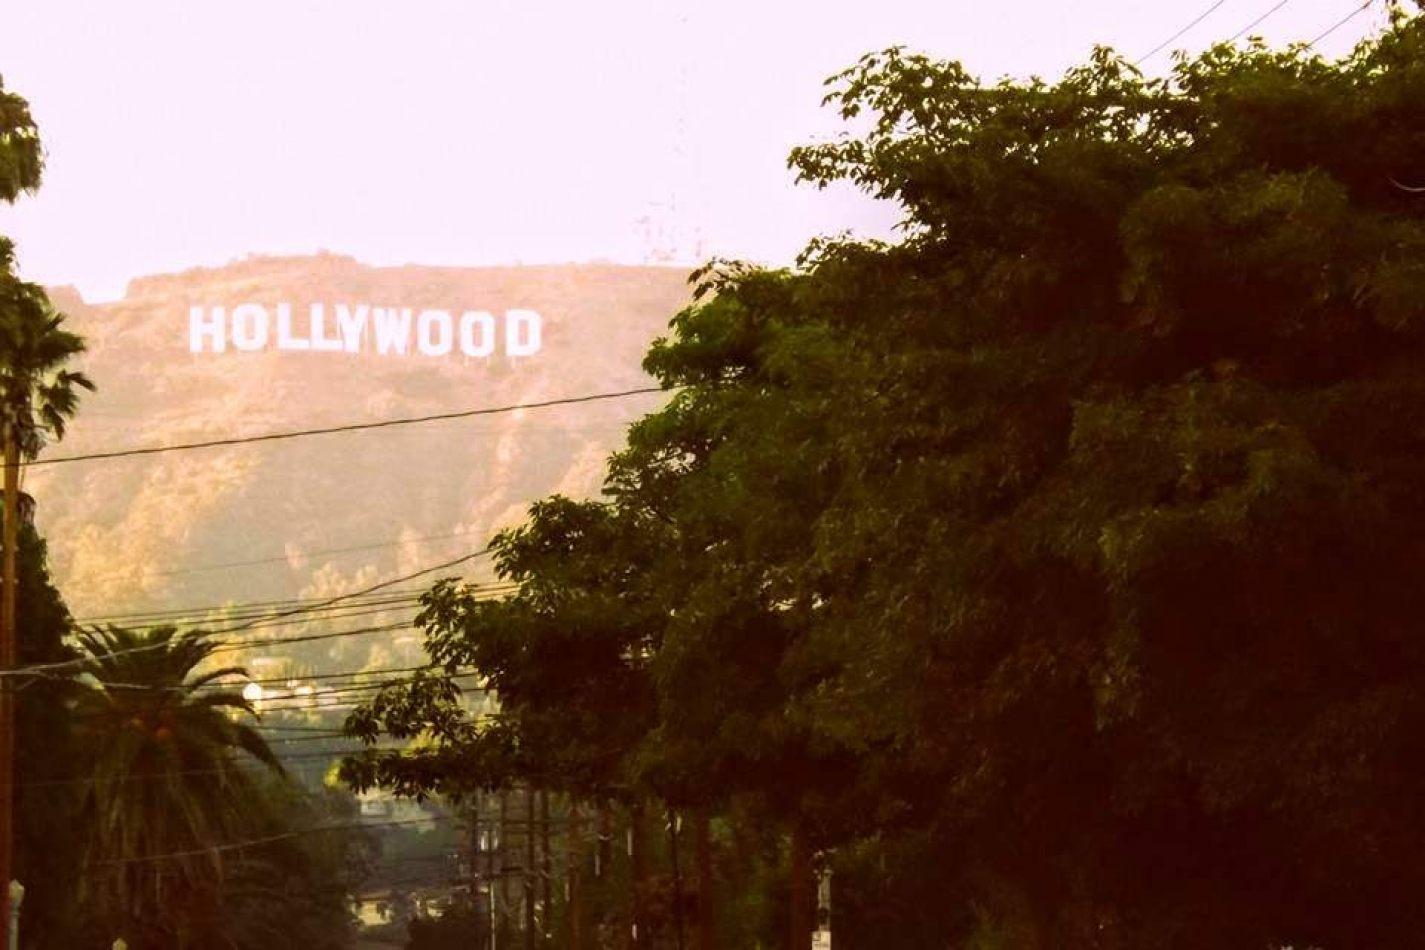 Hibiscus & Nomada : - - Hollywood